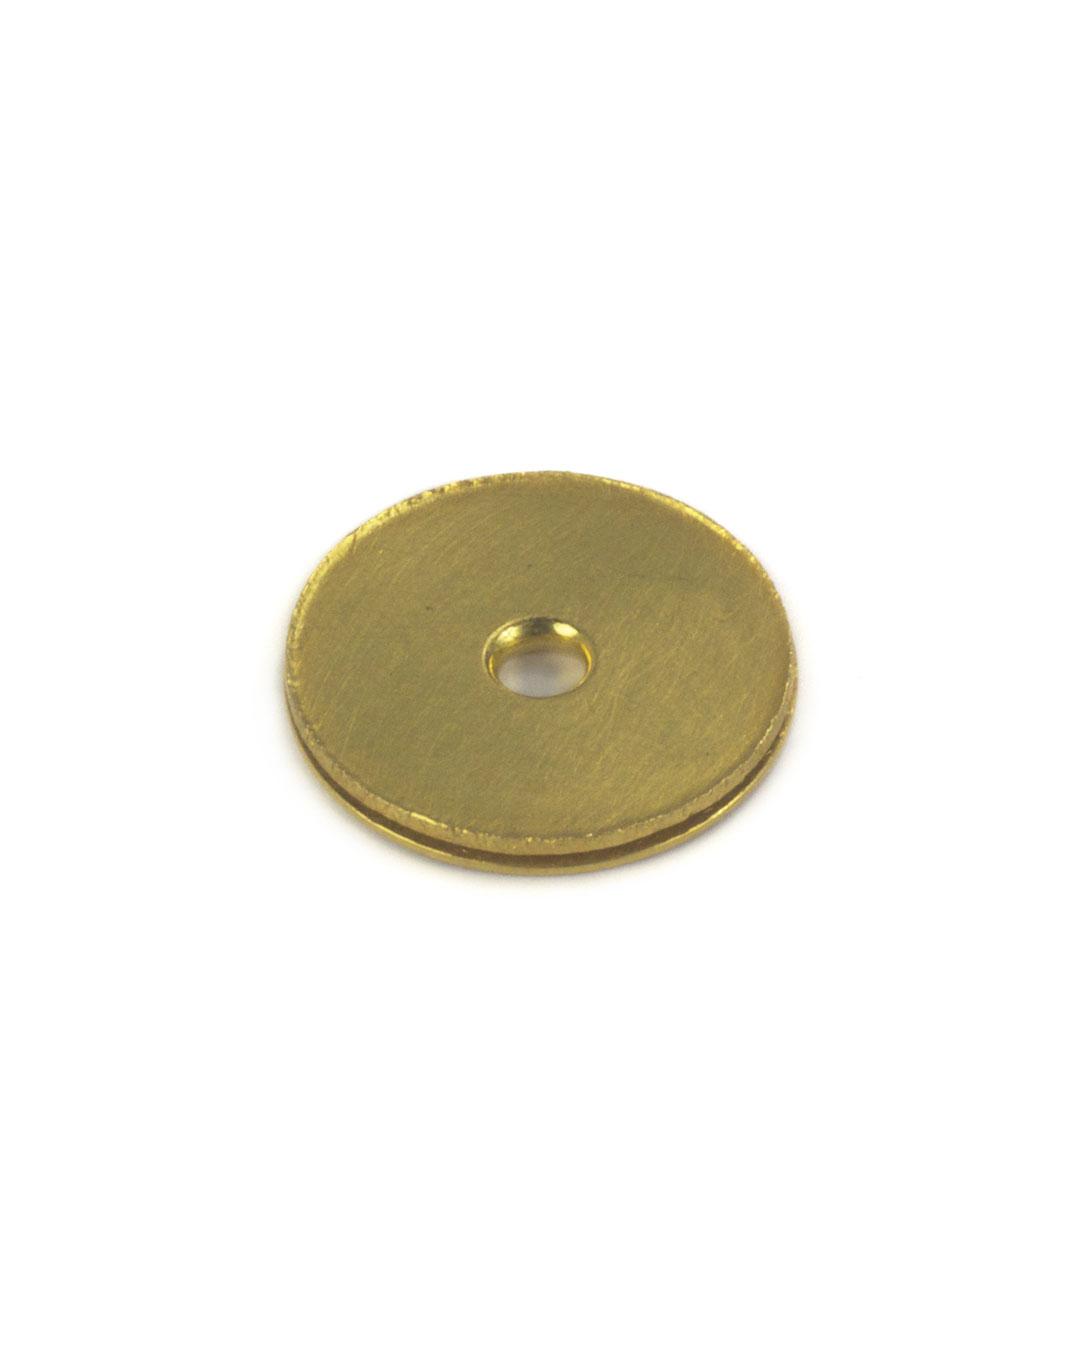 Okinari Kurokawa, untitled, 2002, pendant; 20ct gold, ø 31 x 3 mm